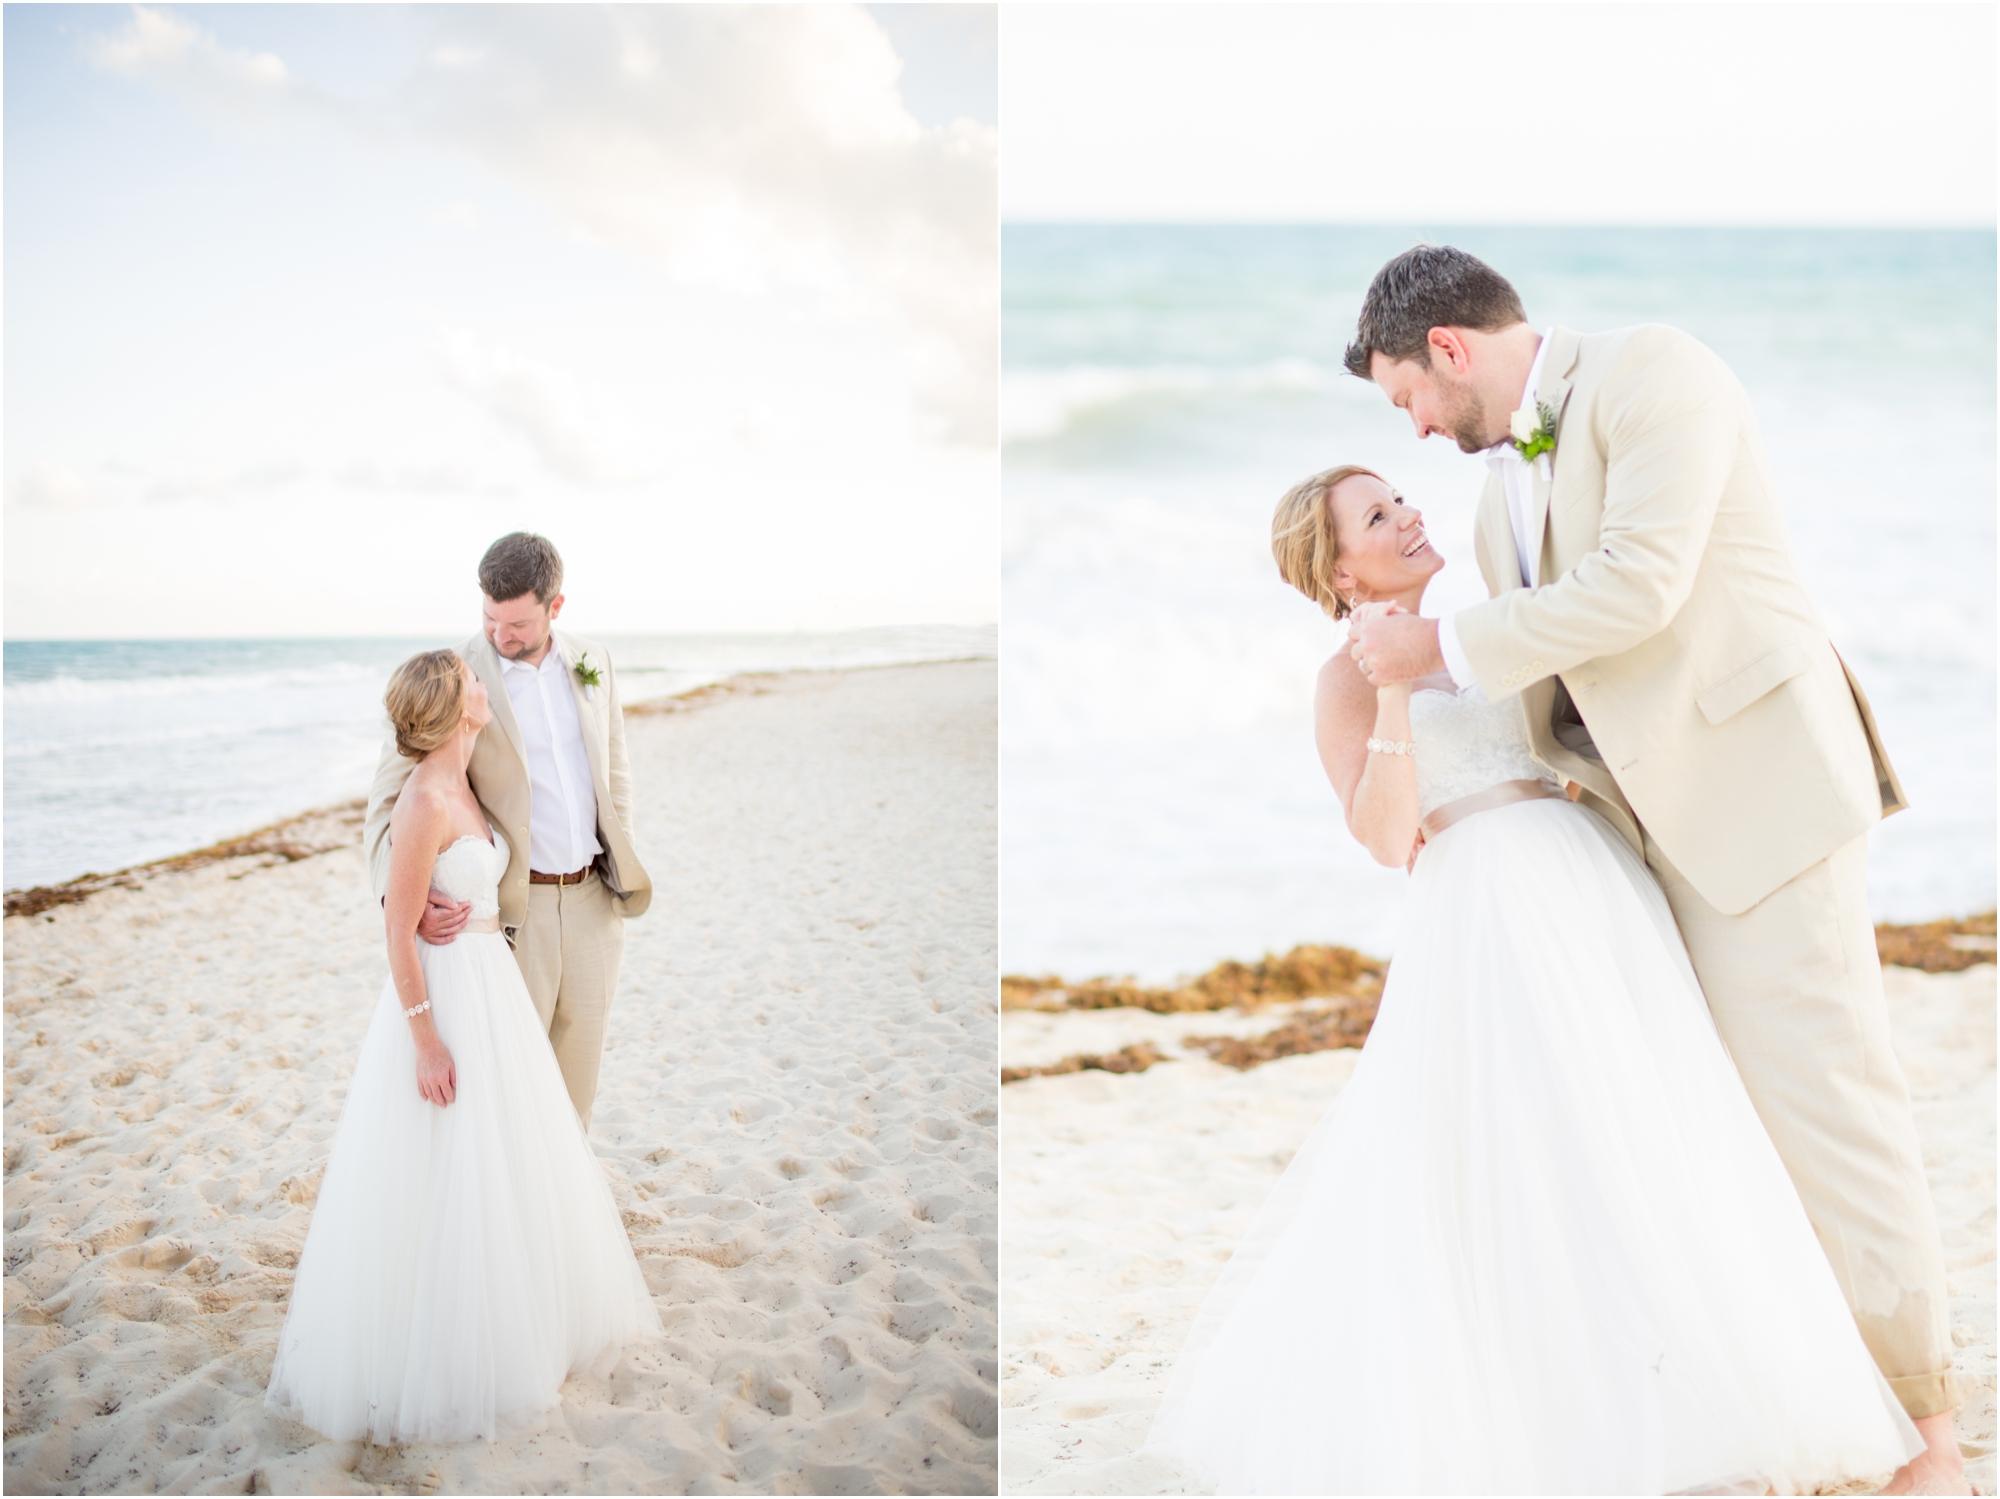 Morosoff Wedding 4-Bride & Groom Portraits-470_anna grace photography destination wedding photographer playa del carmen mexico photo.jpg